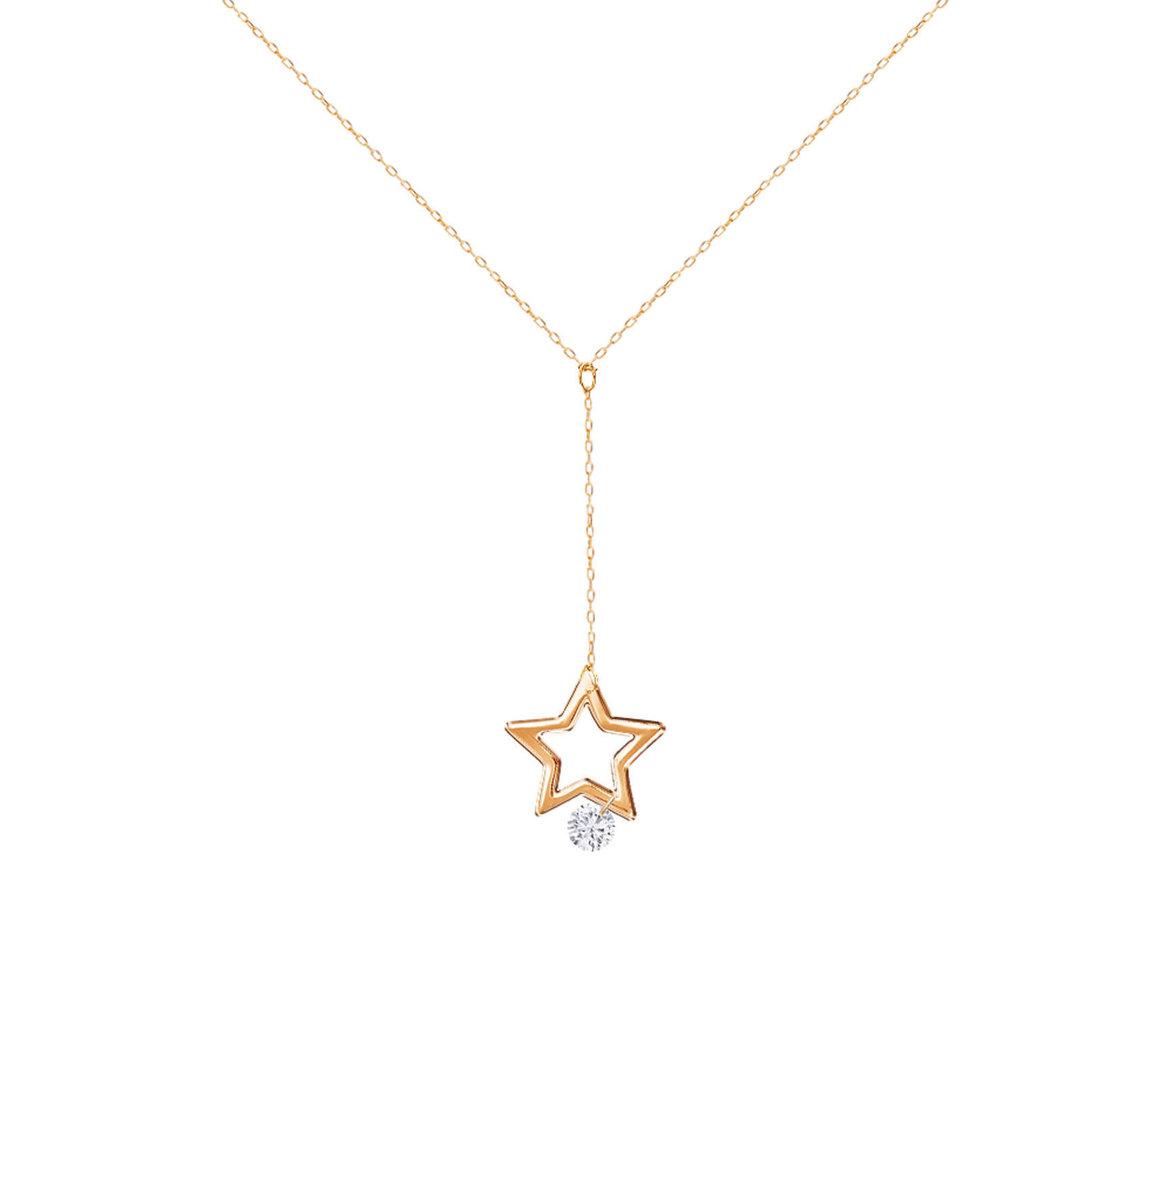 Starry Diamond Necklace